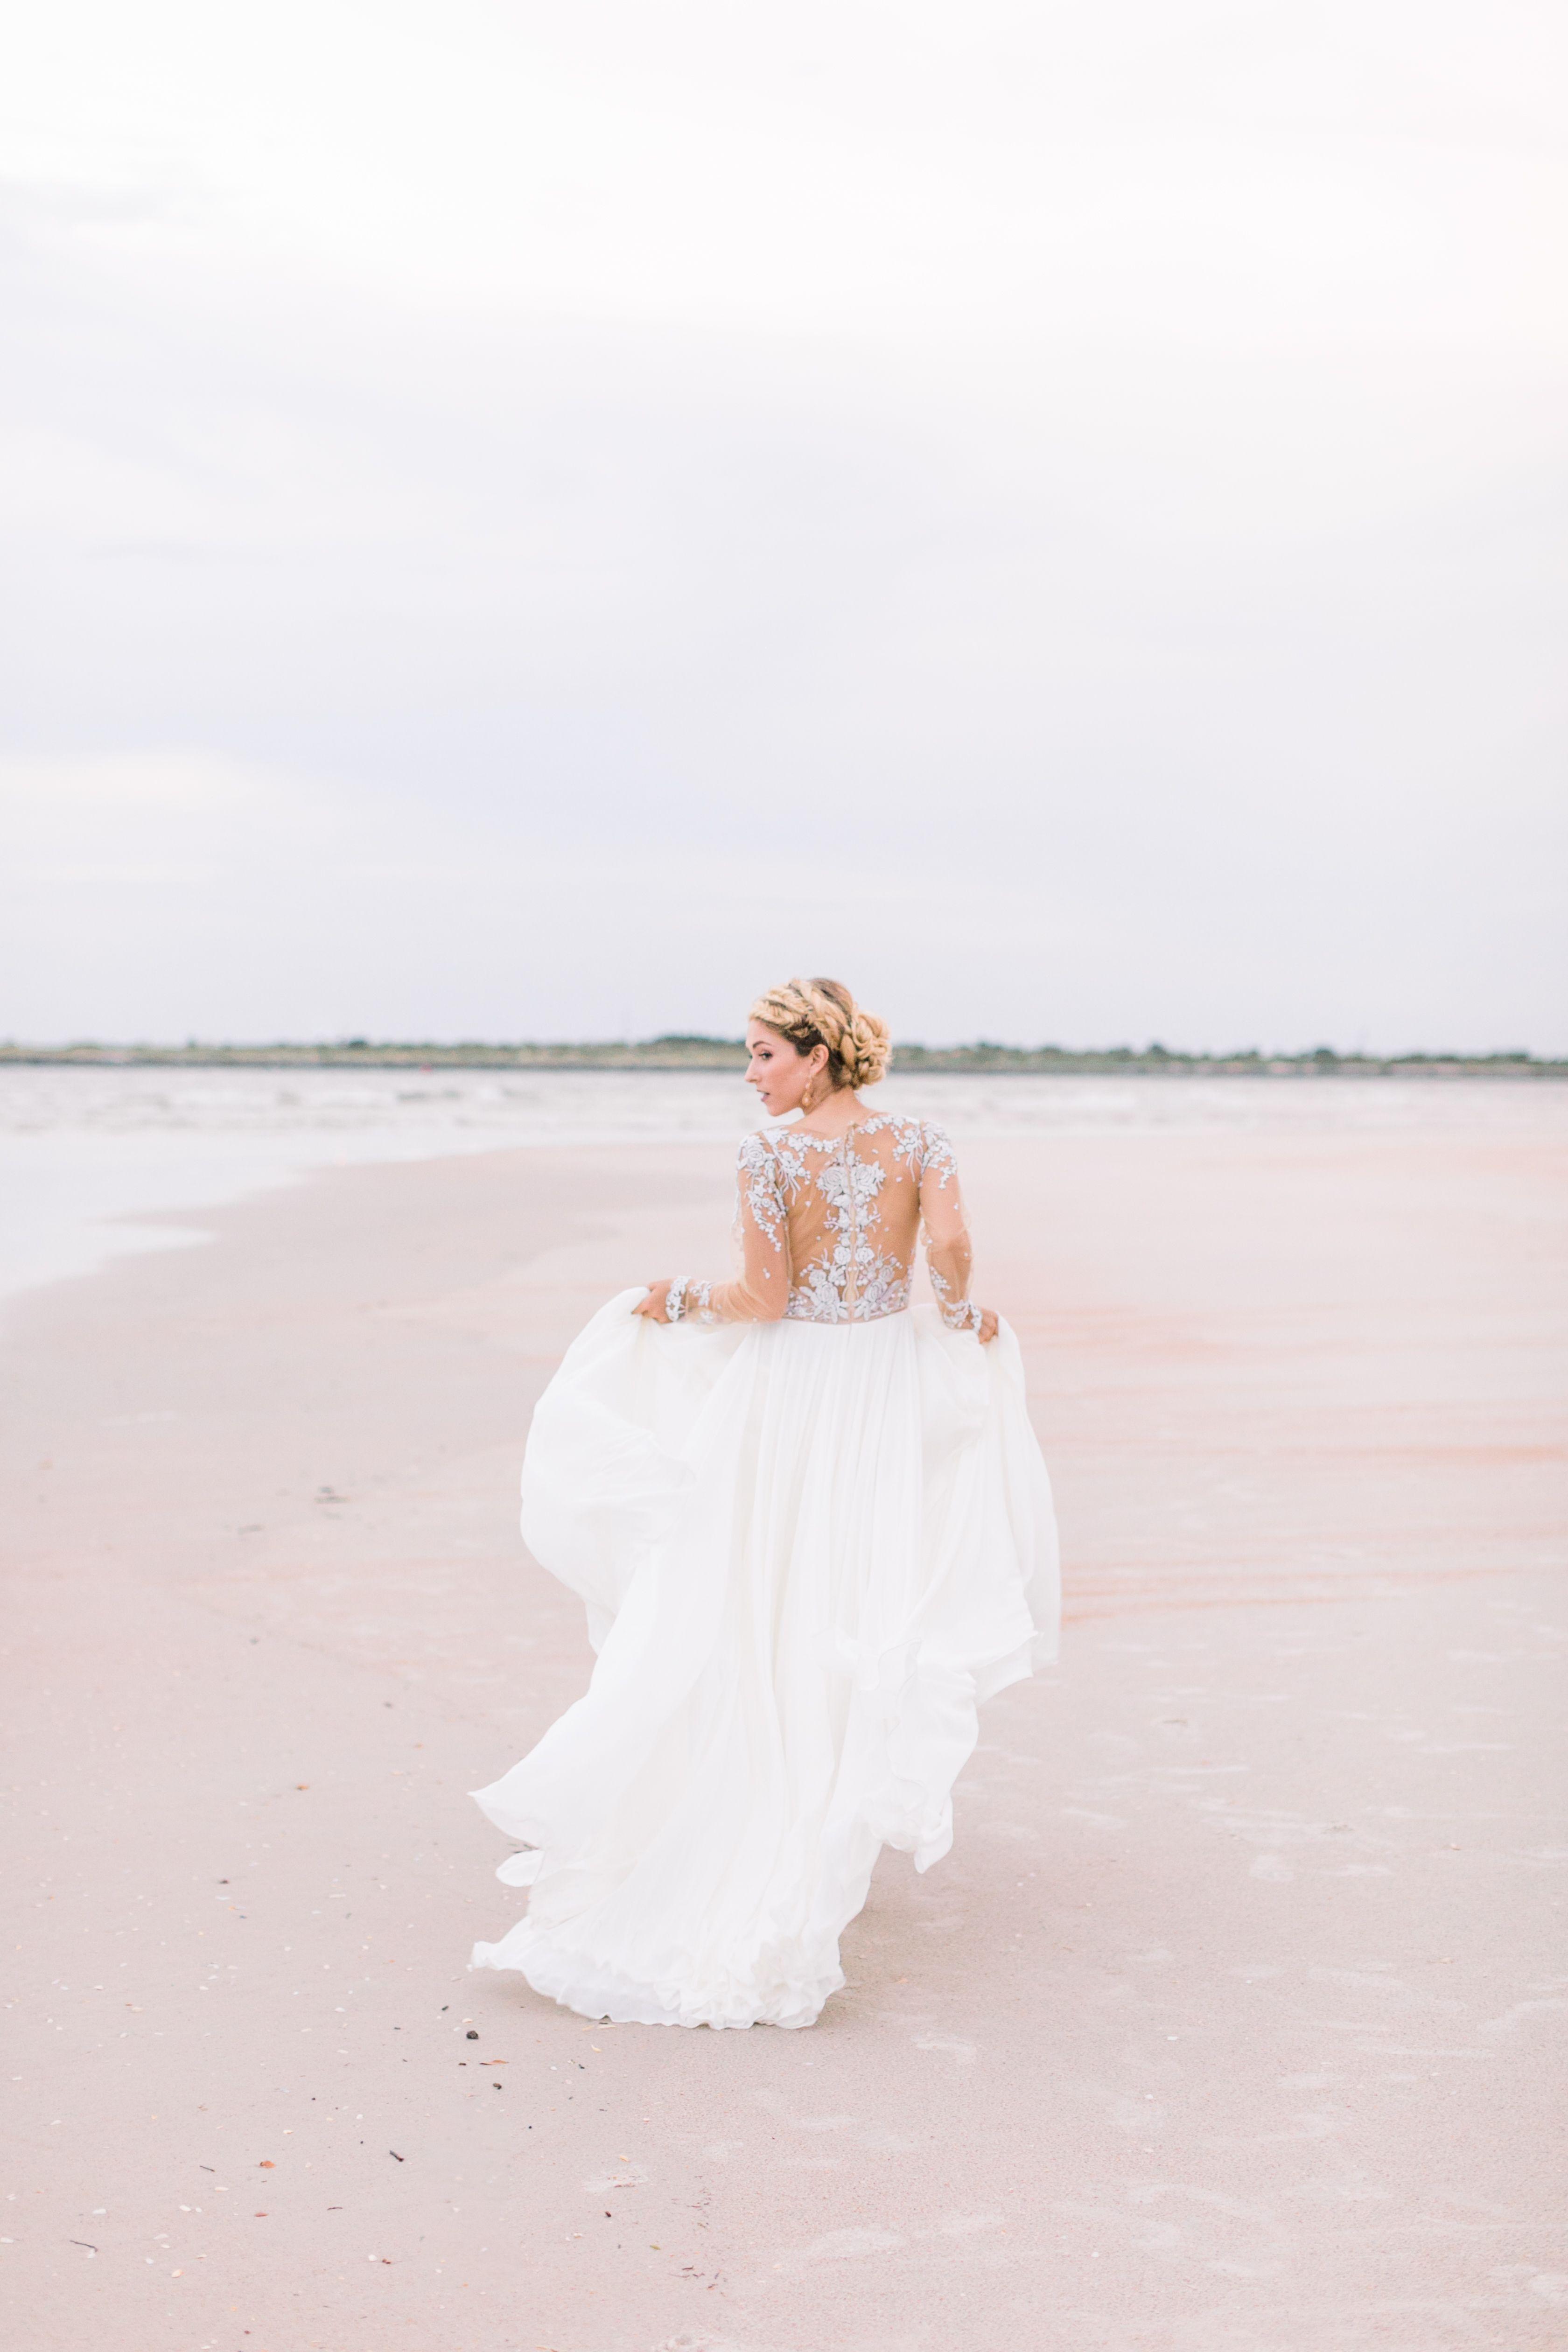 Beach Wedding Ideas Fine Art Design bohoweddingideas